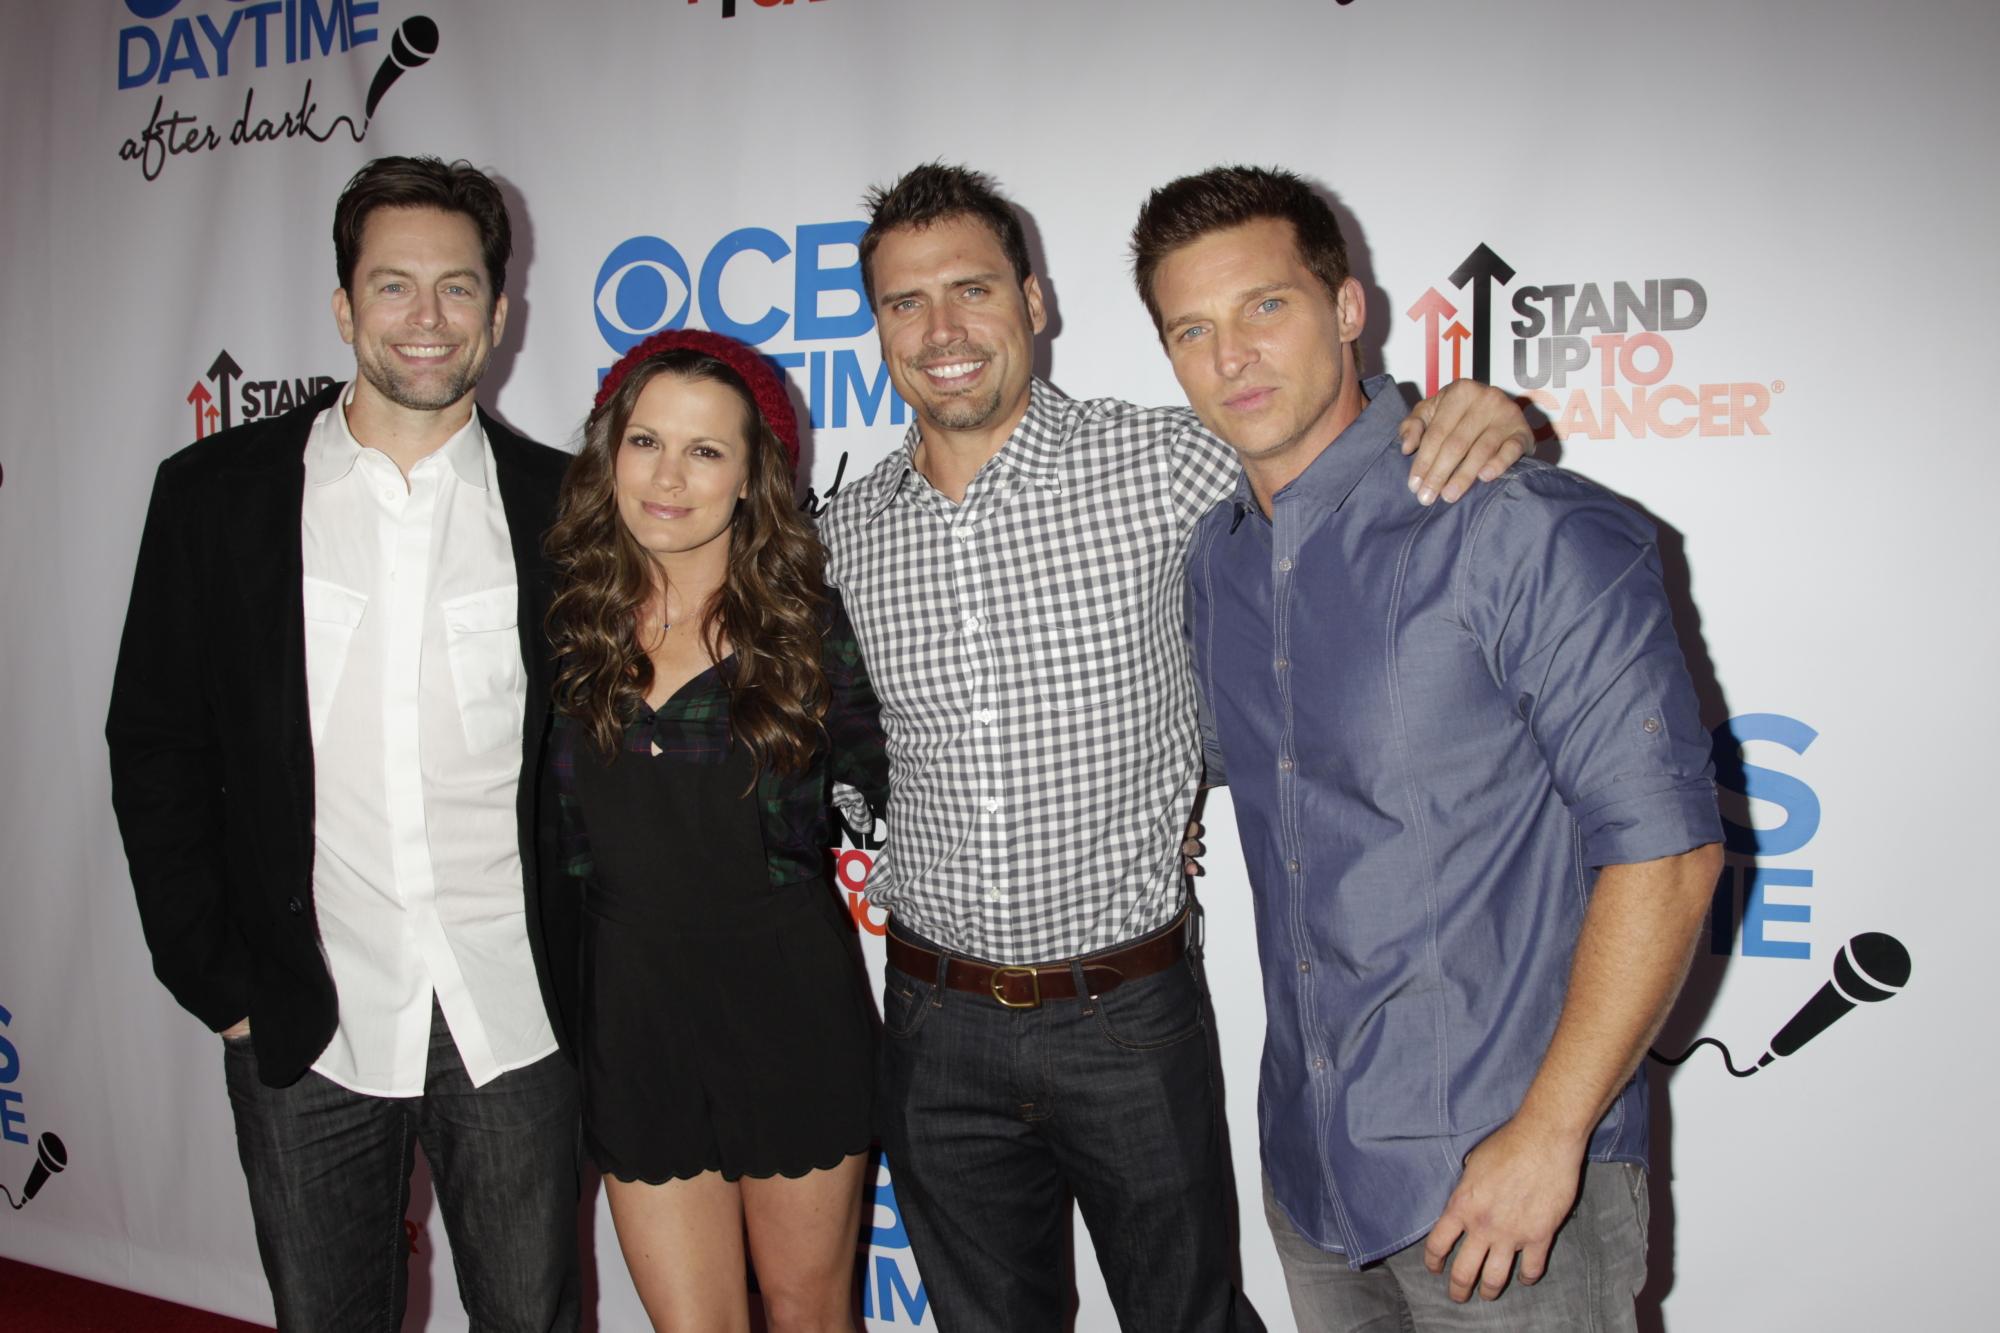 Michael, Melissa, Joshua, and Steve